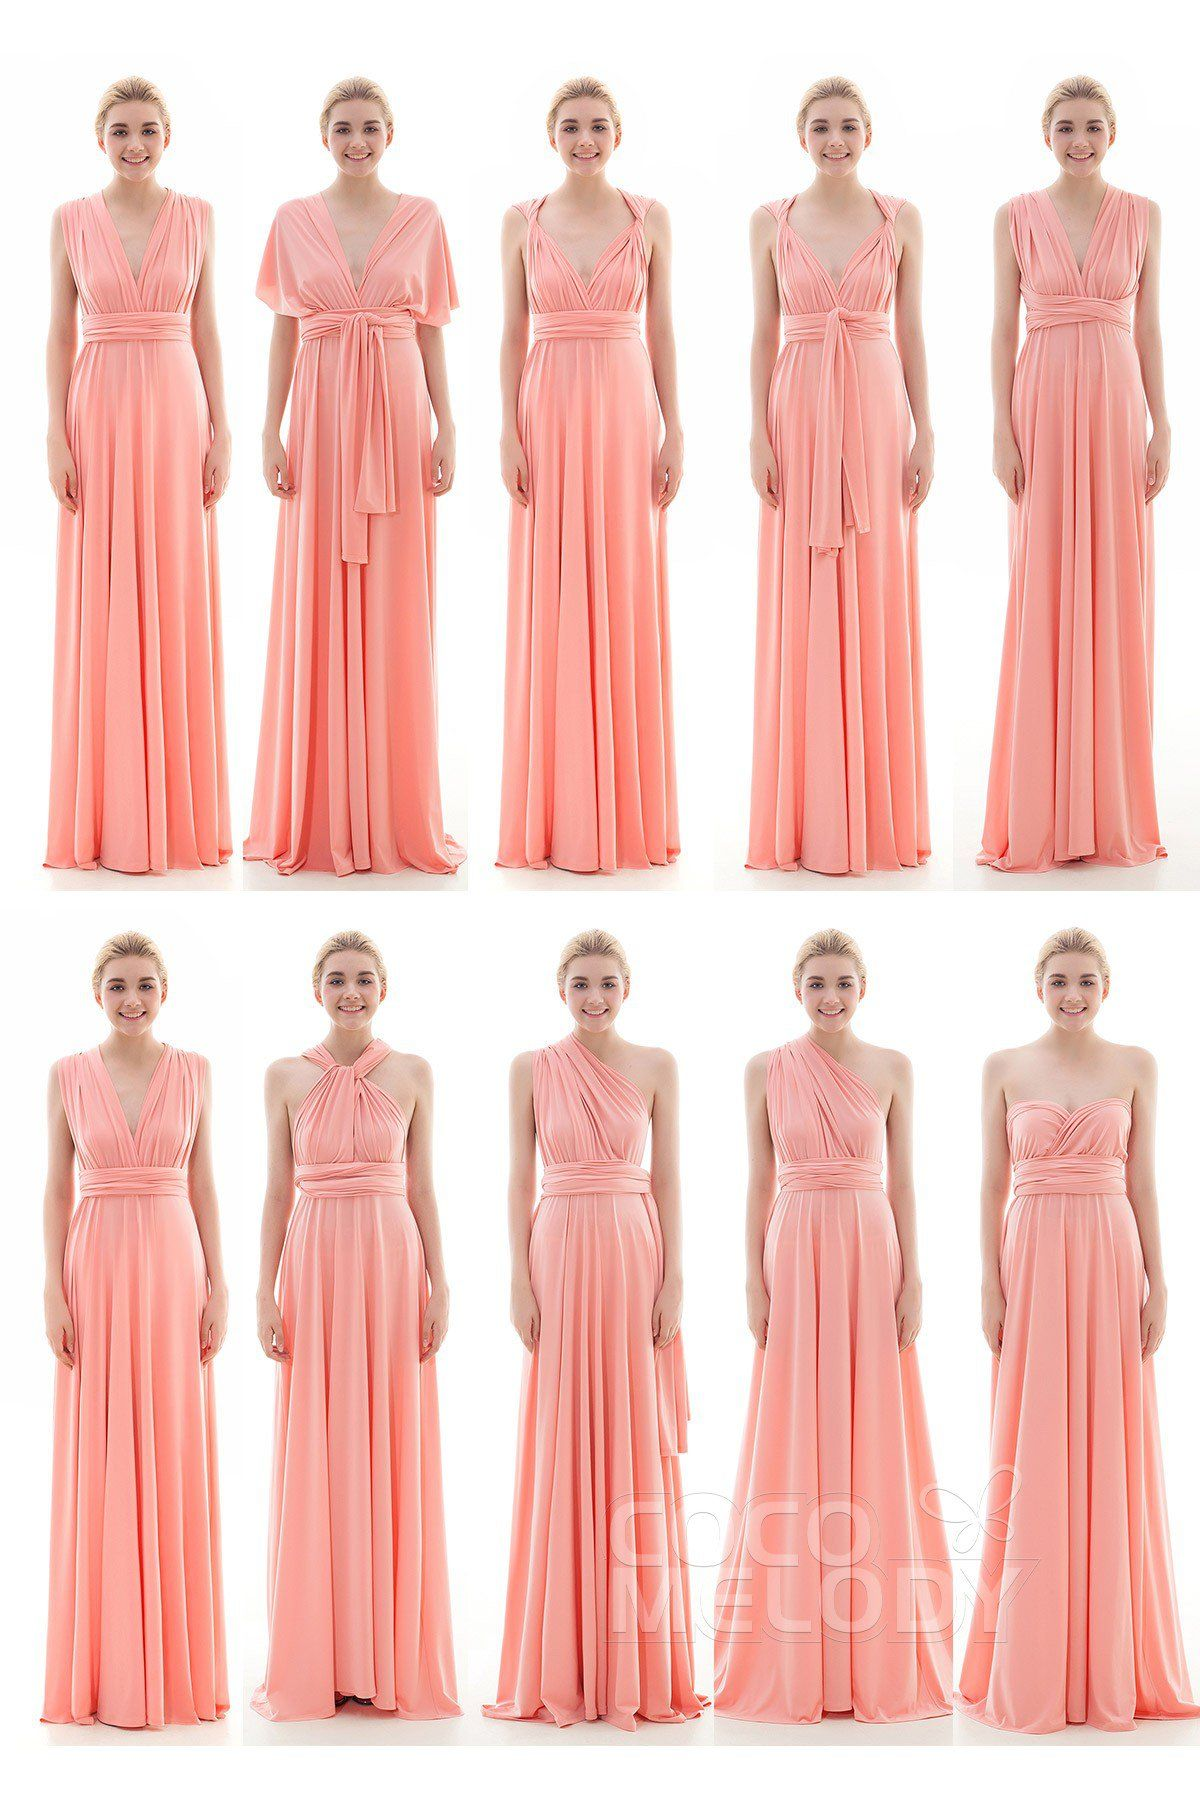 eb6c16a3e23 Divine Sheath-Column Natural Floor Length Knitted Fabric Sleeveless  Convertible Bridesmaid Dress COEF16001 Cocomelody bridesmaid dress  bridesmaid ...